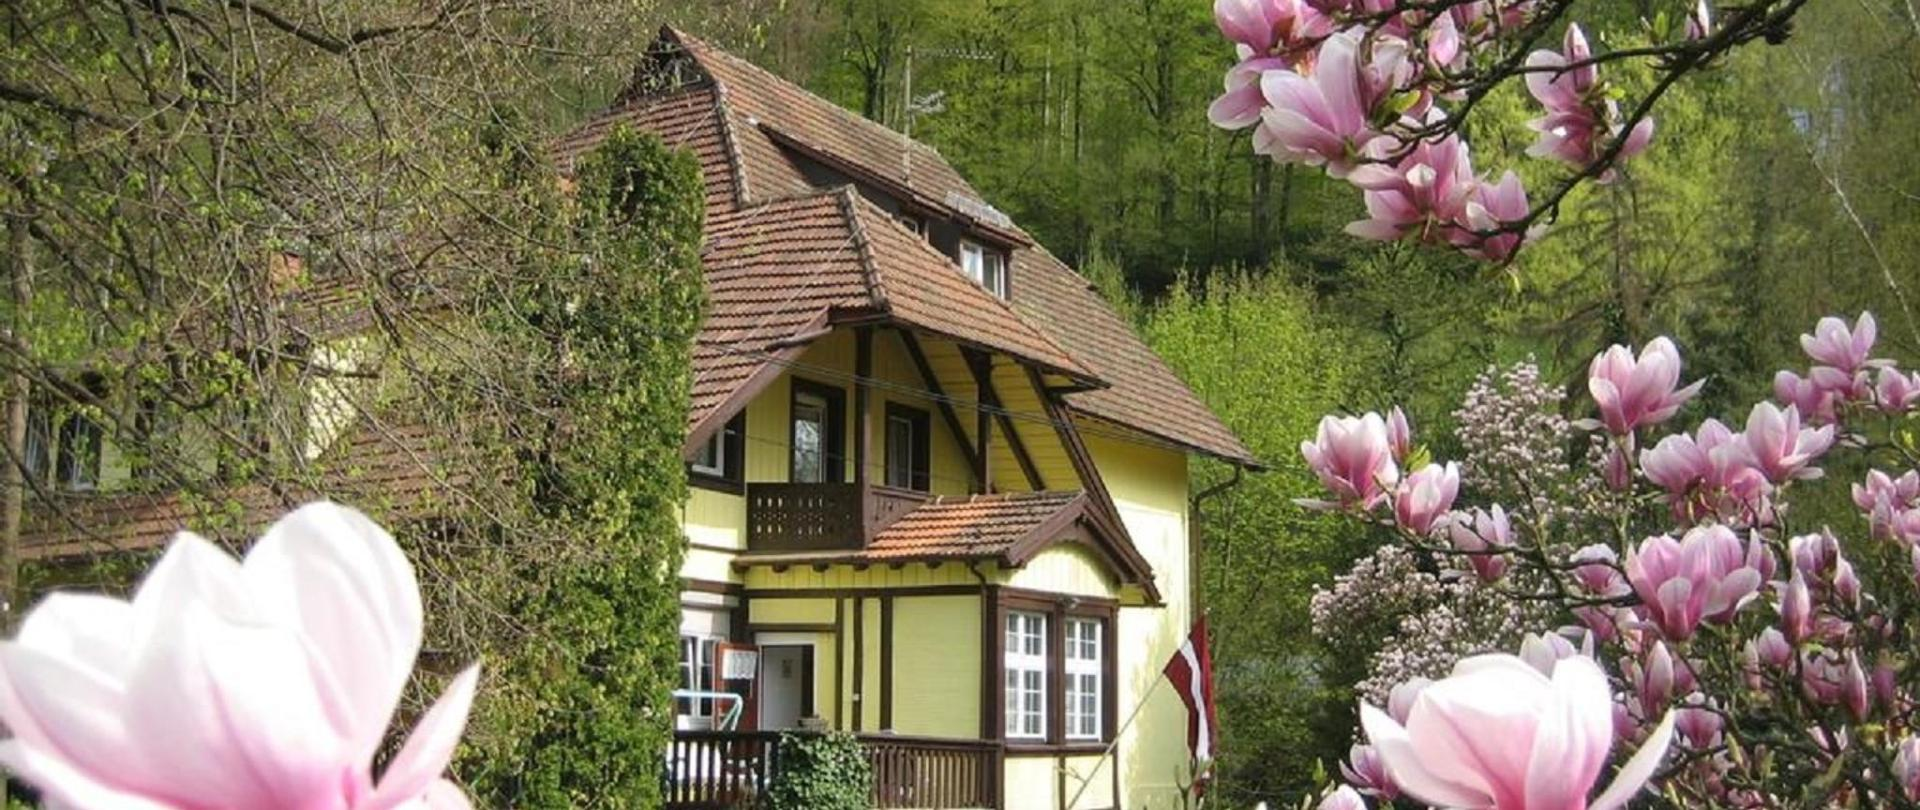 Latvian house